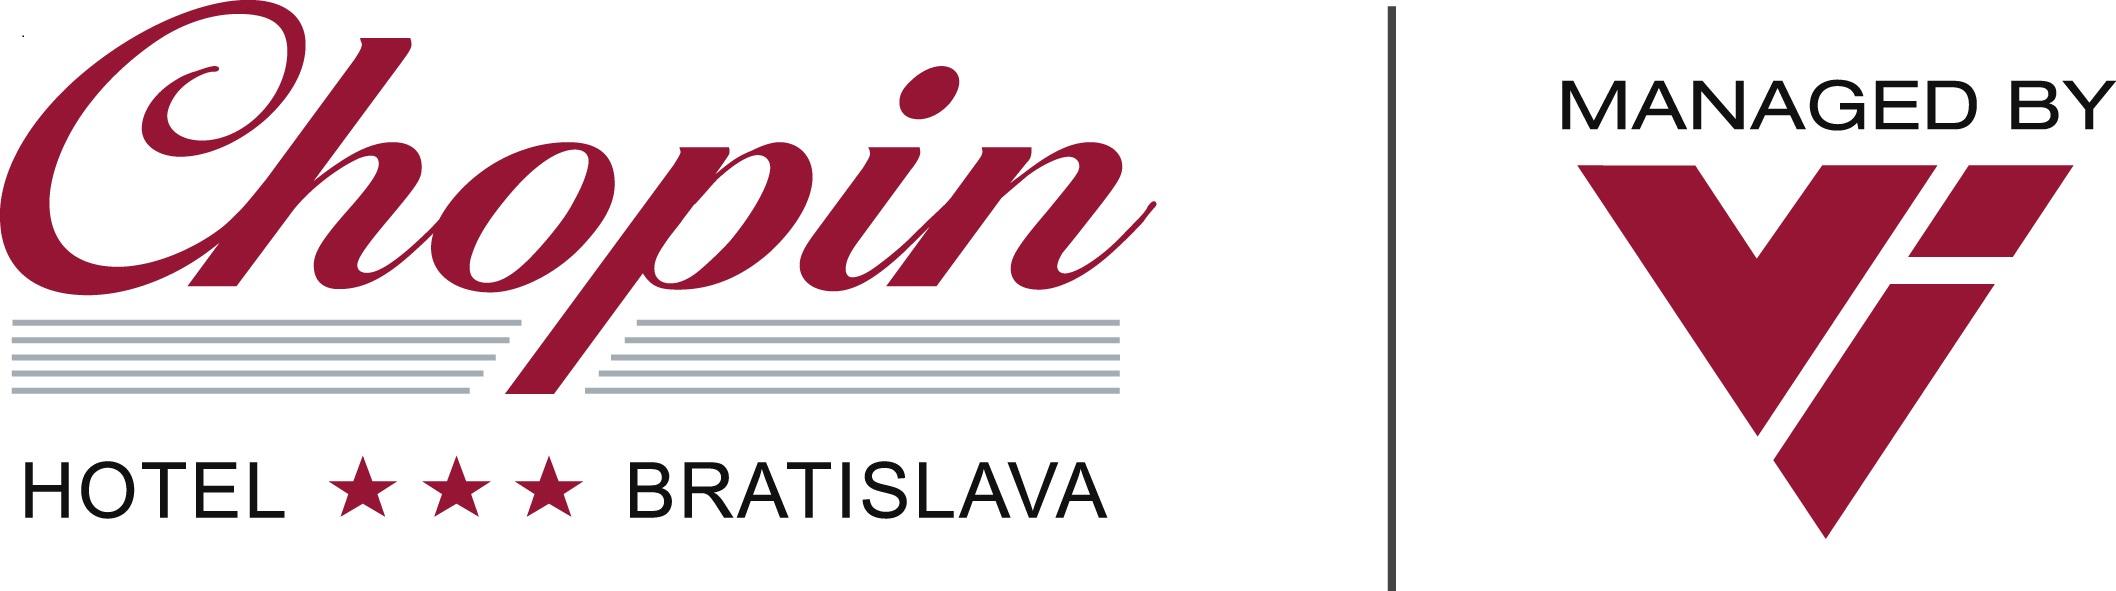 chopin_hotel_bratislava-with-vi